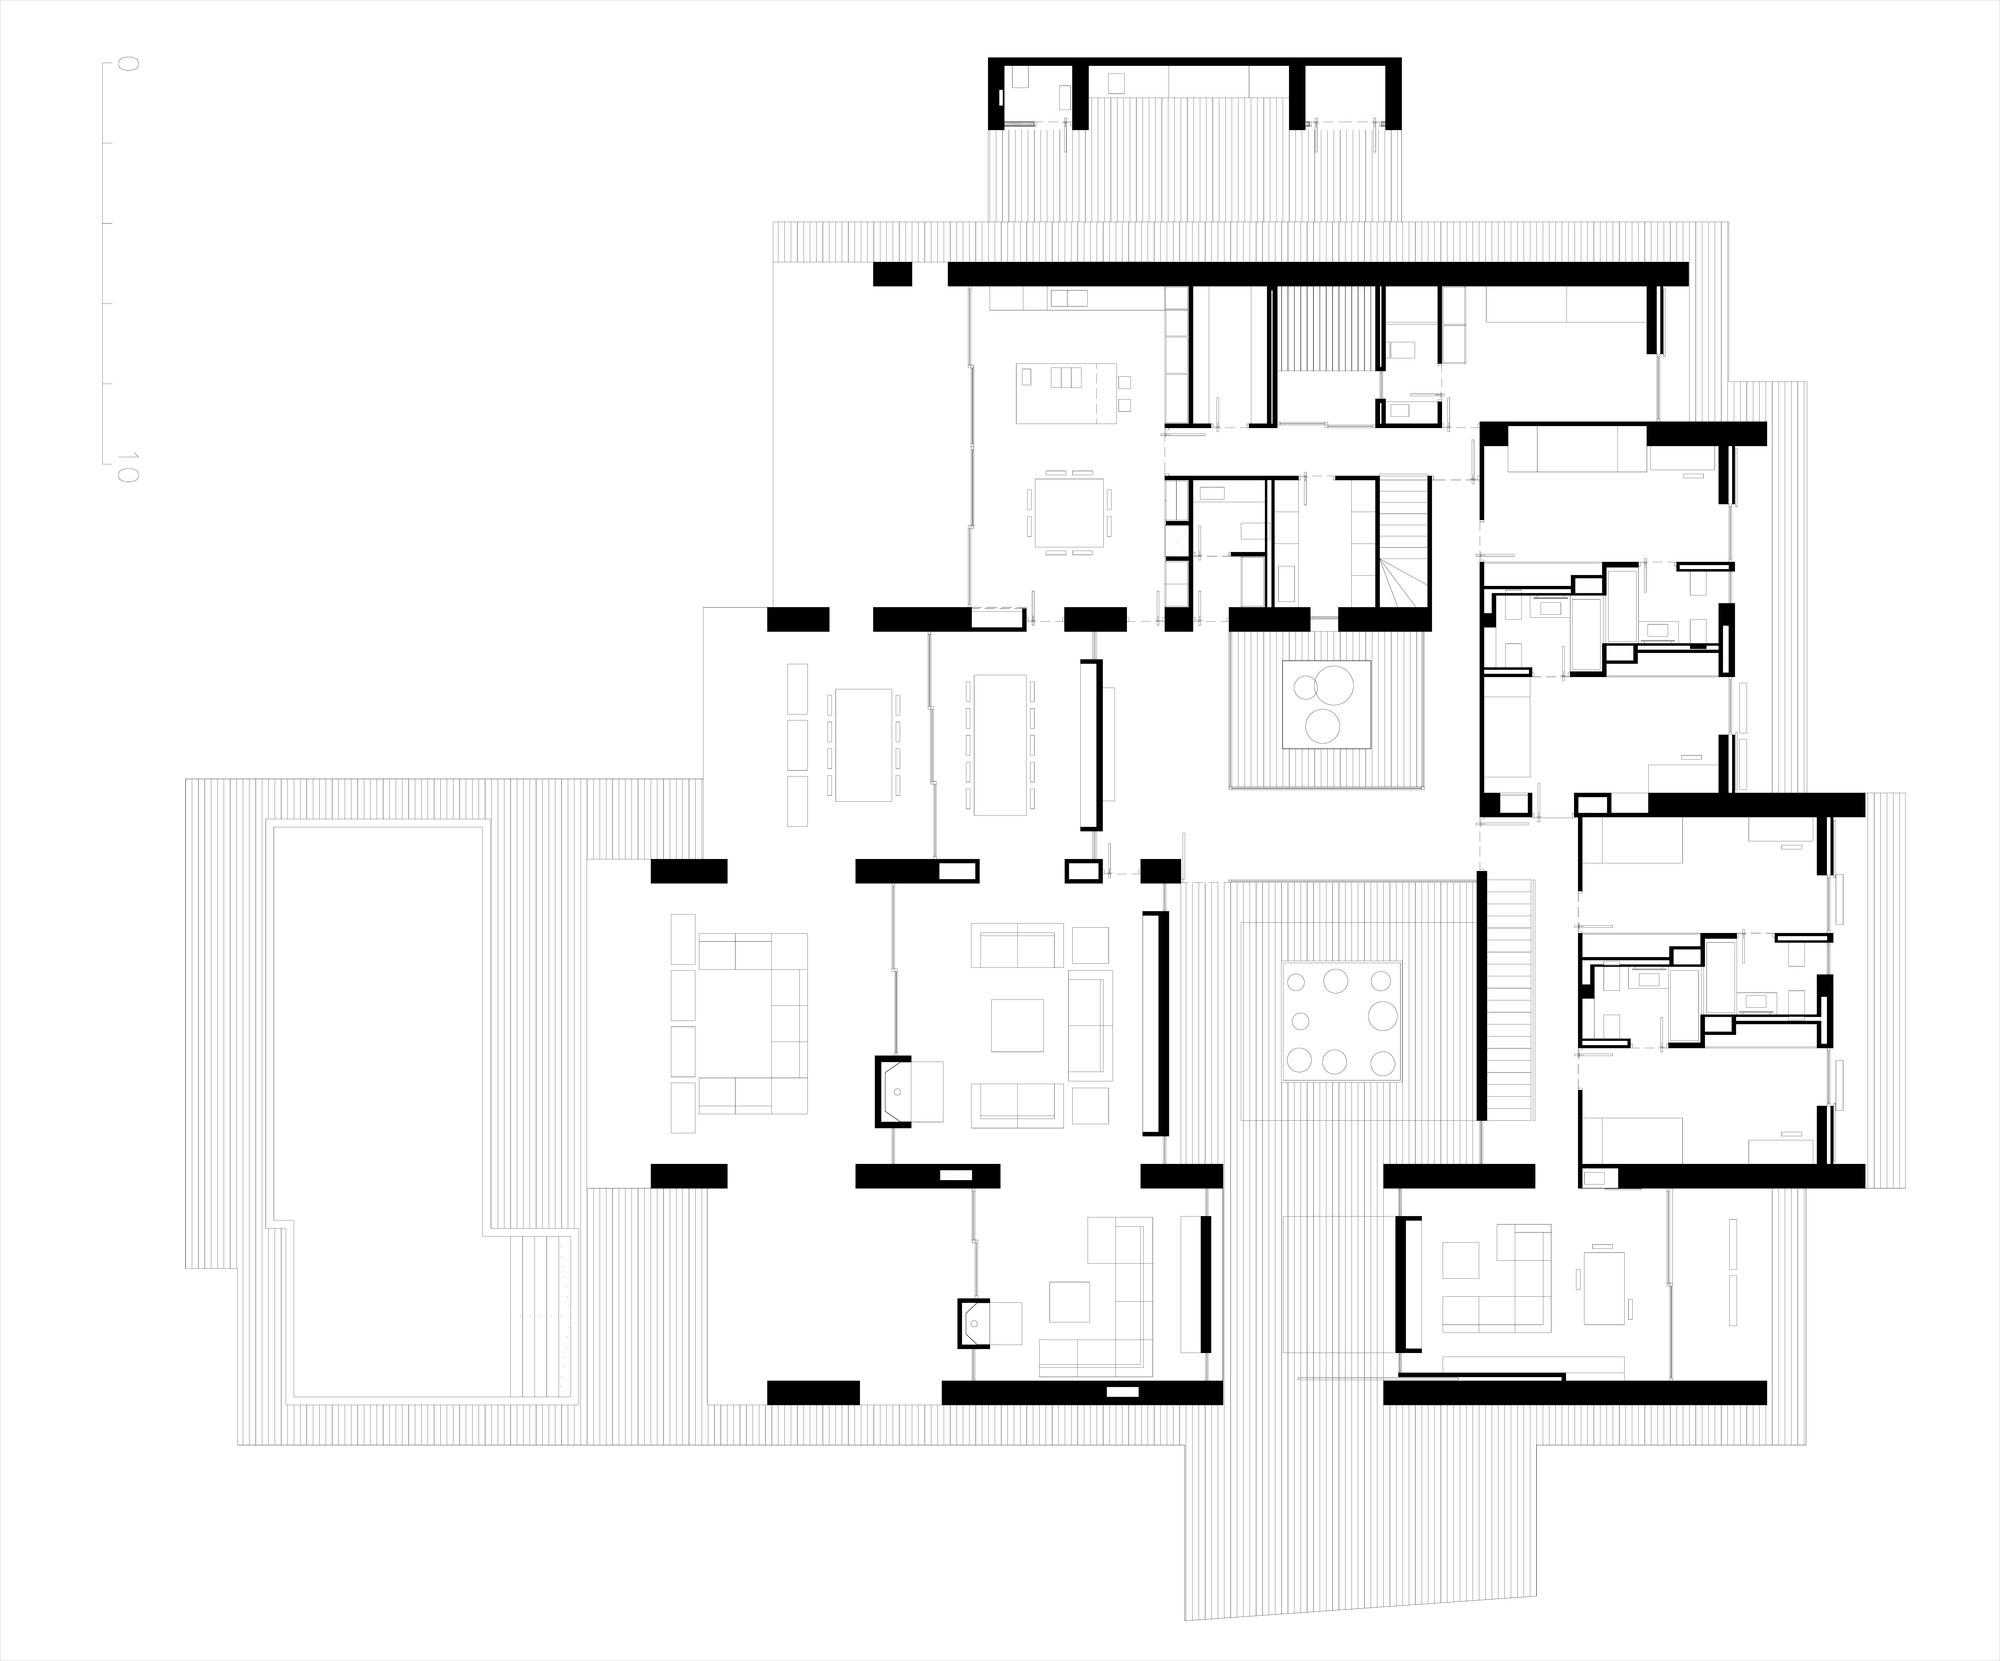 First Floor Plan, Contemporary Home in Monasterios, Spain